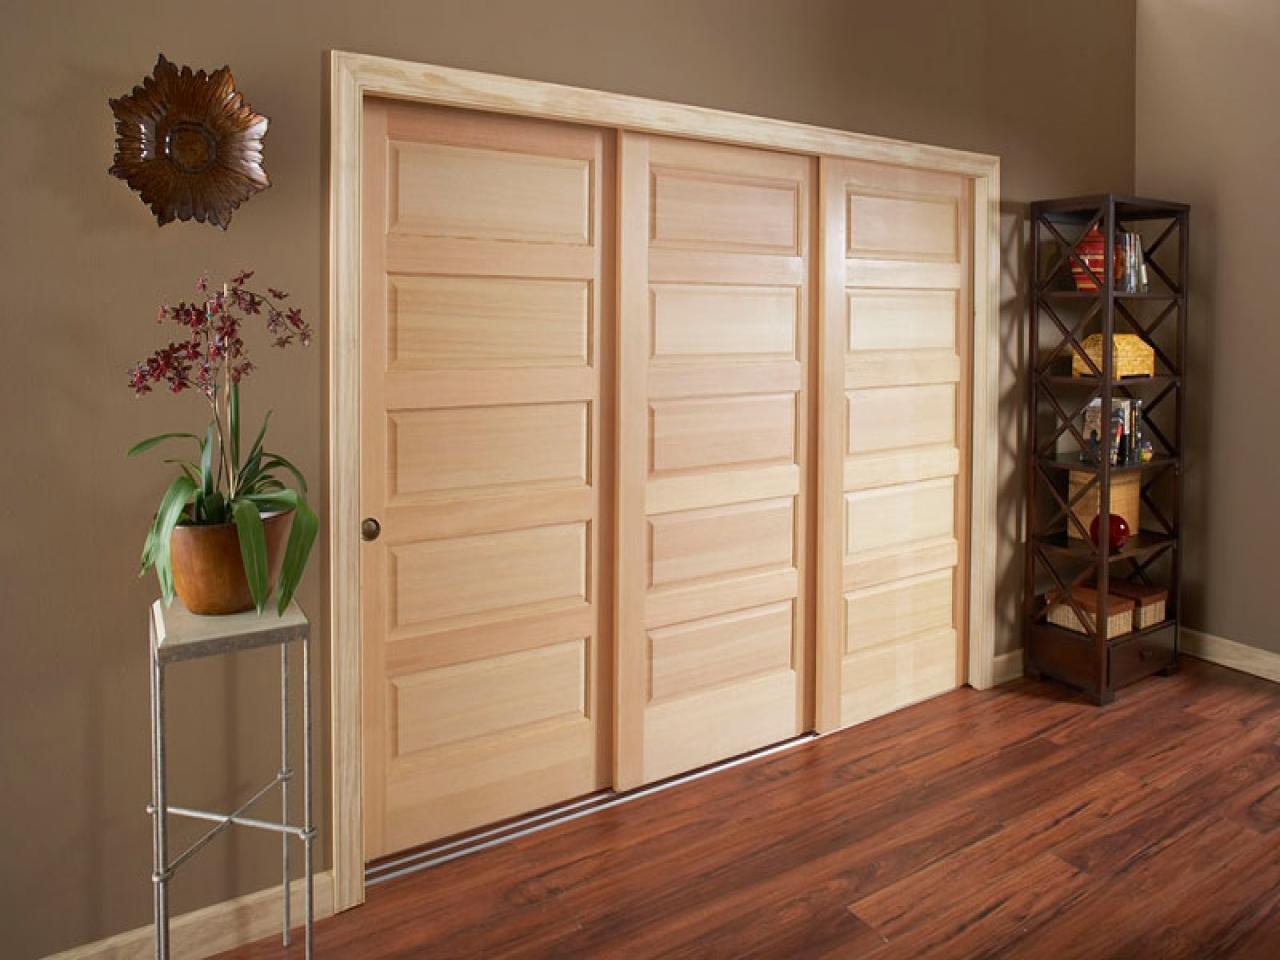 Triple Sliding Closet Door Track1280 X 960